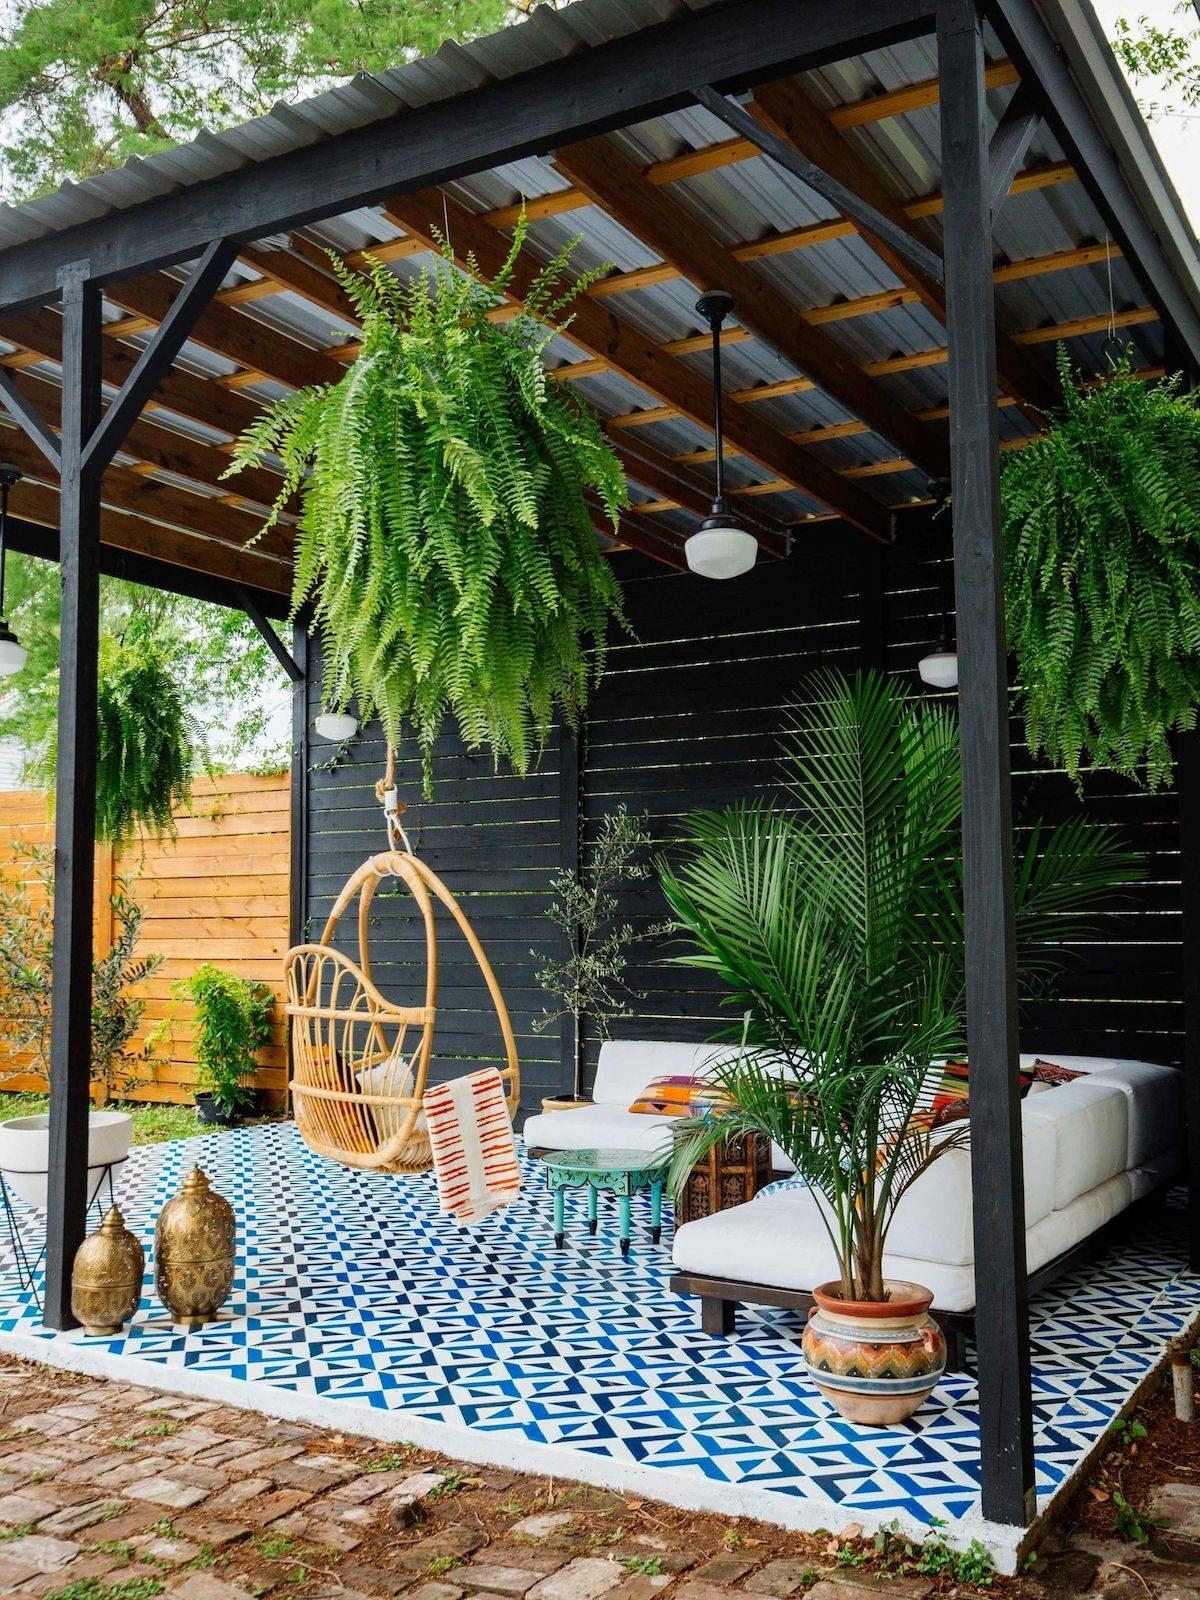 terrasse noire pergola sol bleu canapé blanc plantes vertes